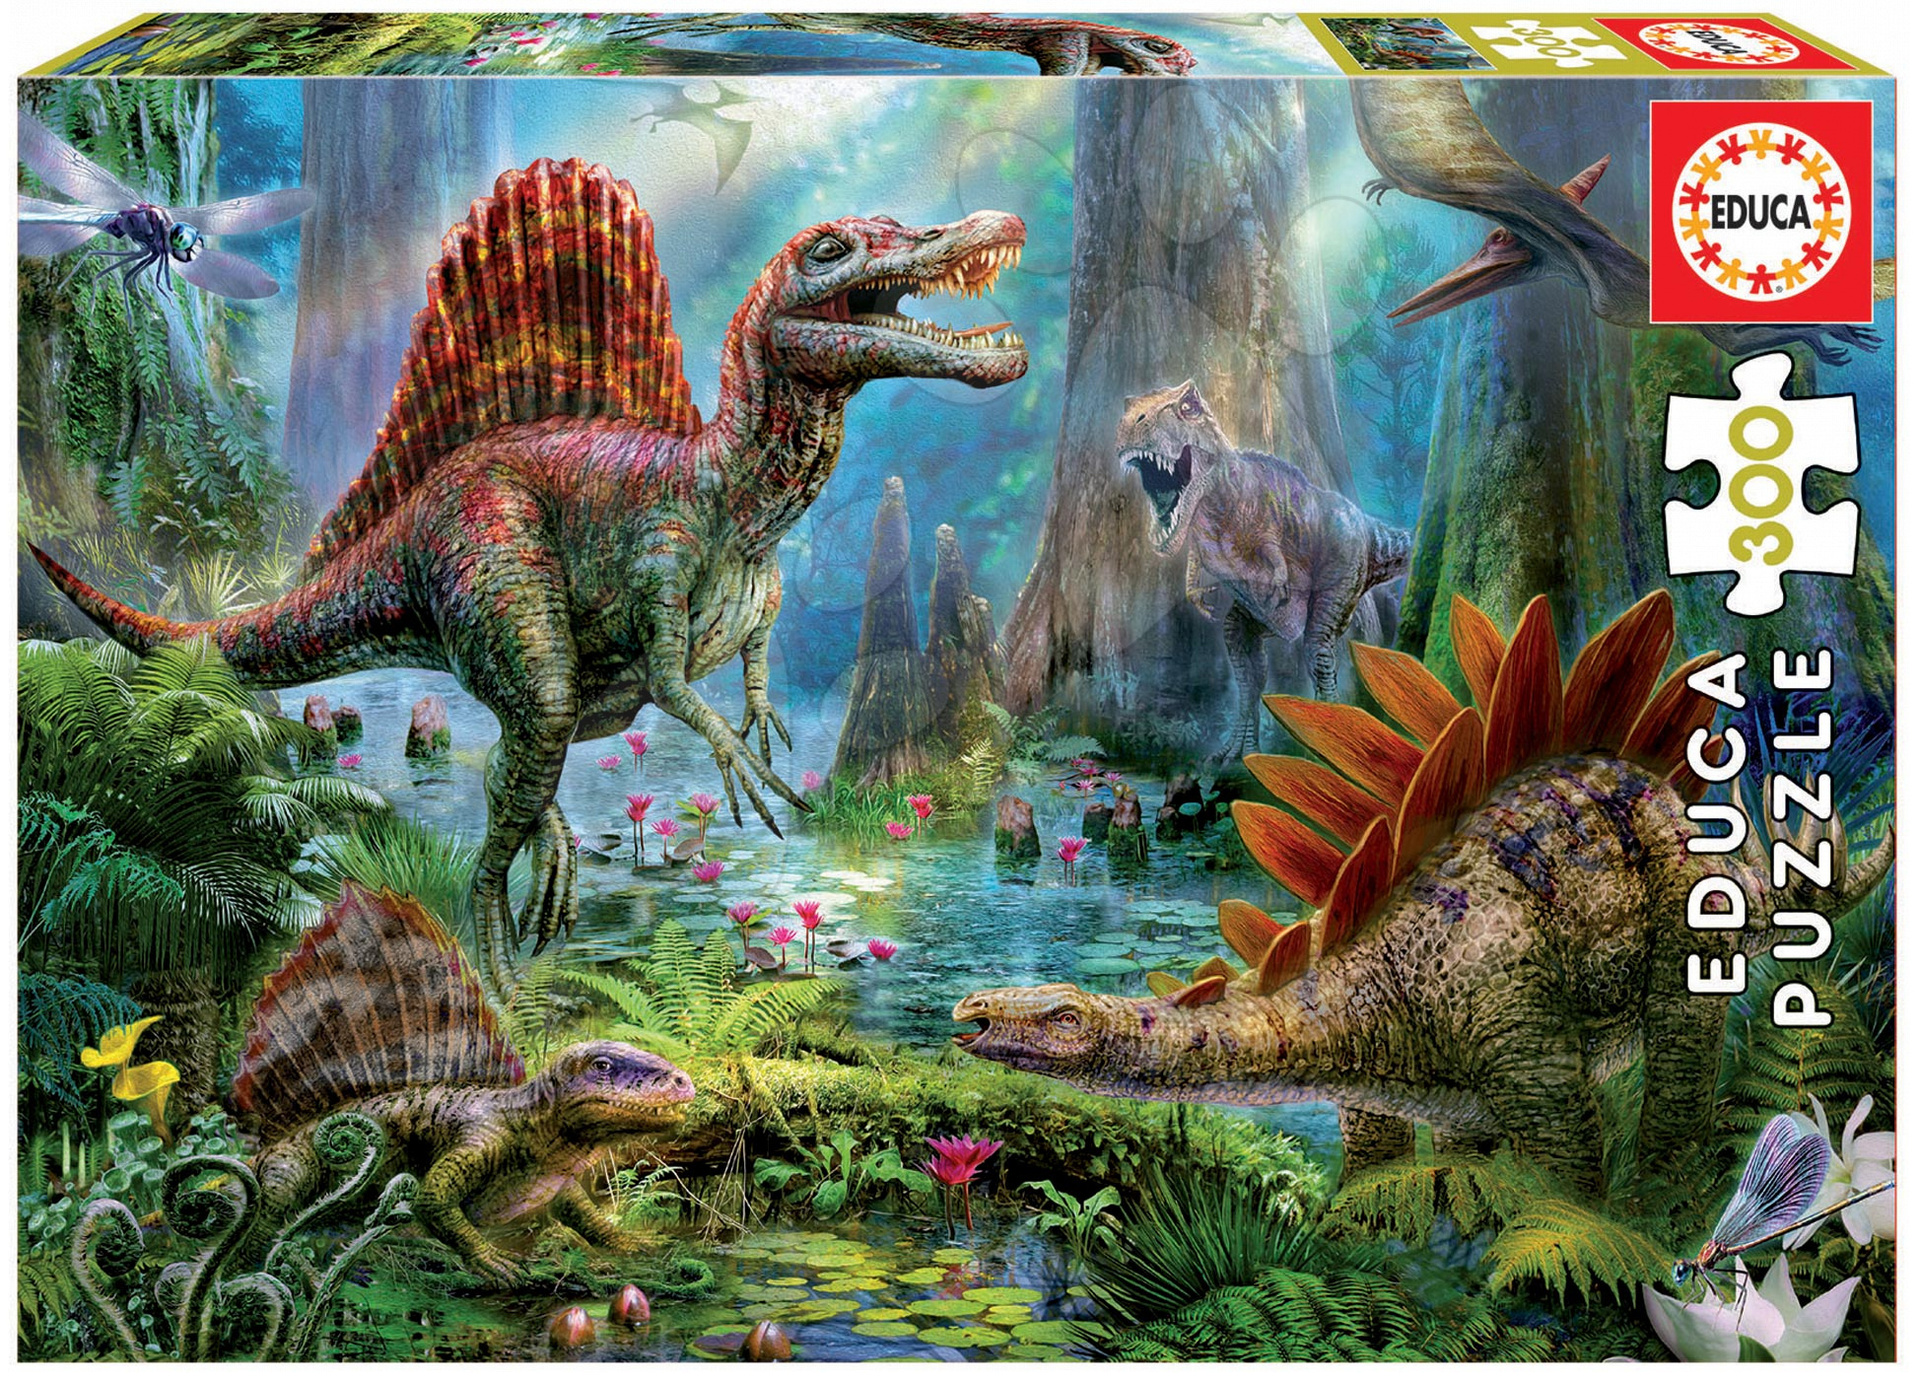 Puzzle Dinosaurus Educa 300 dílů od 8 let